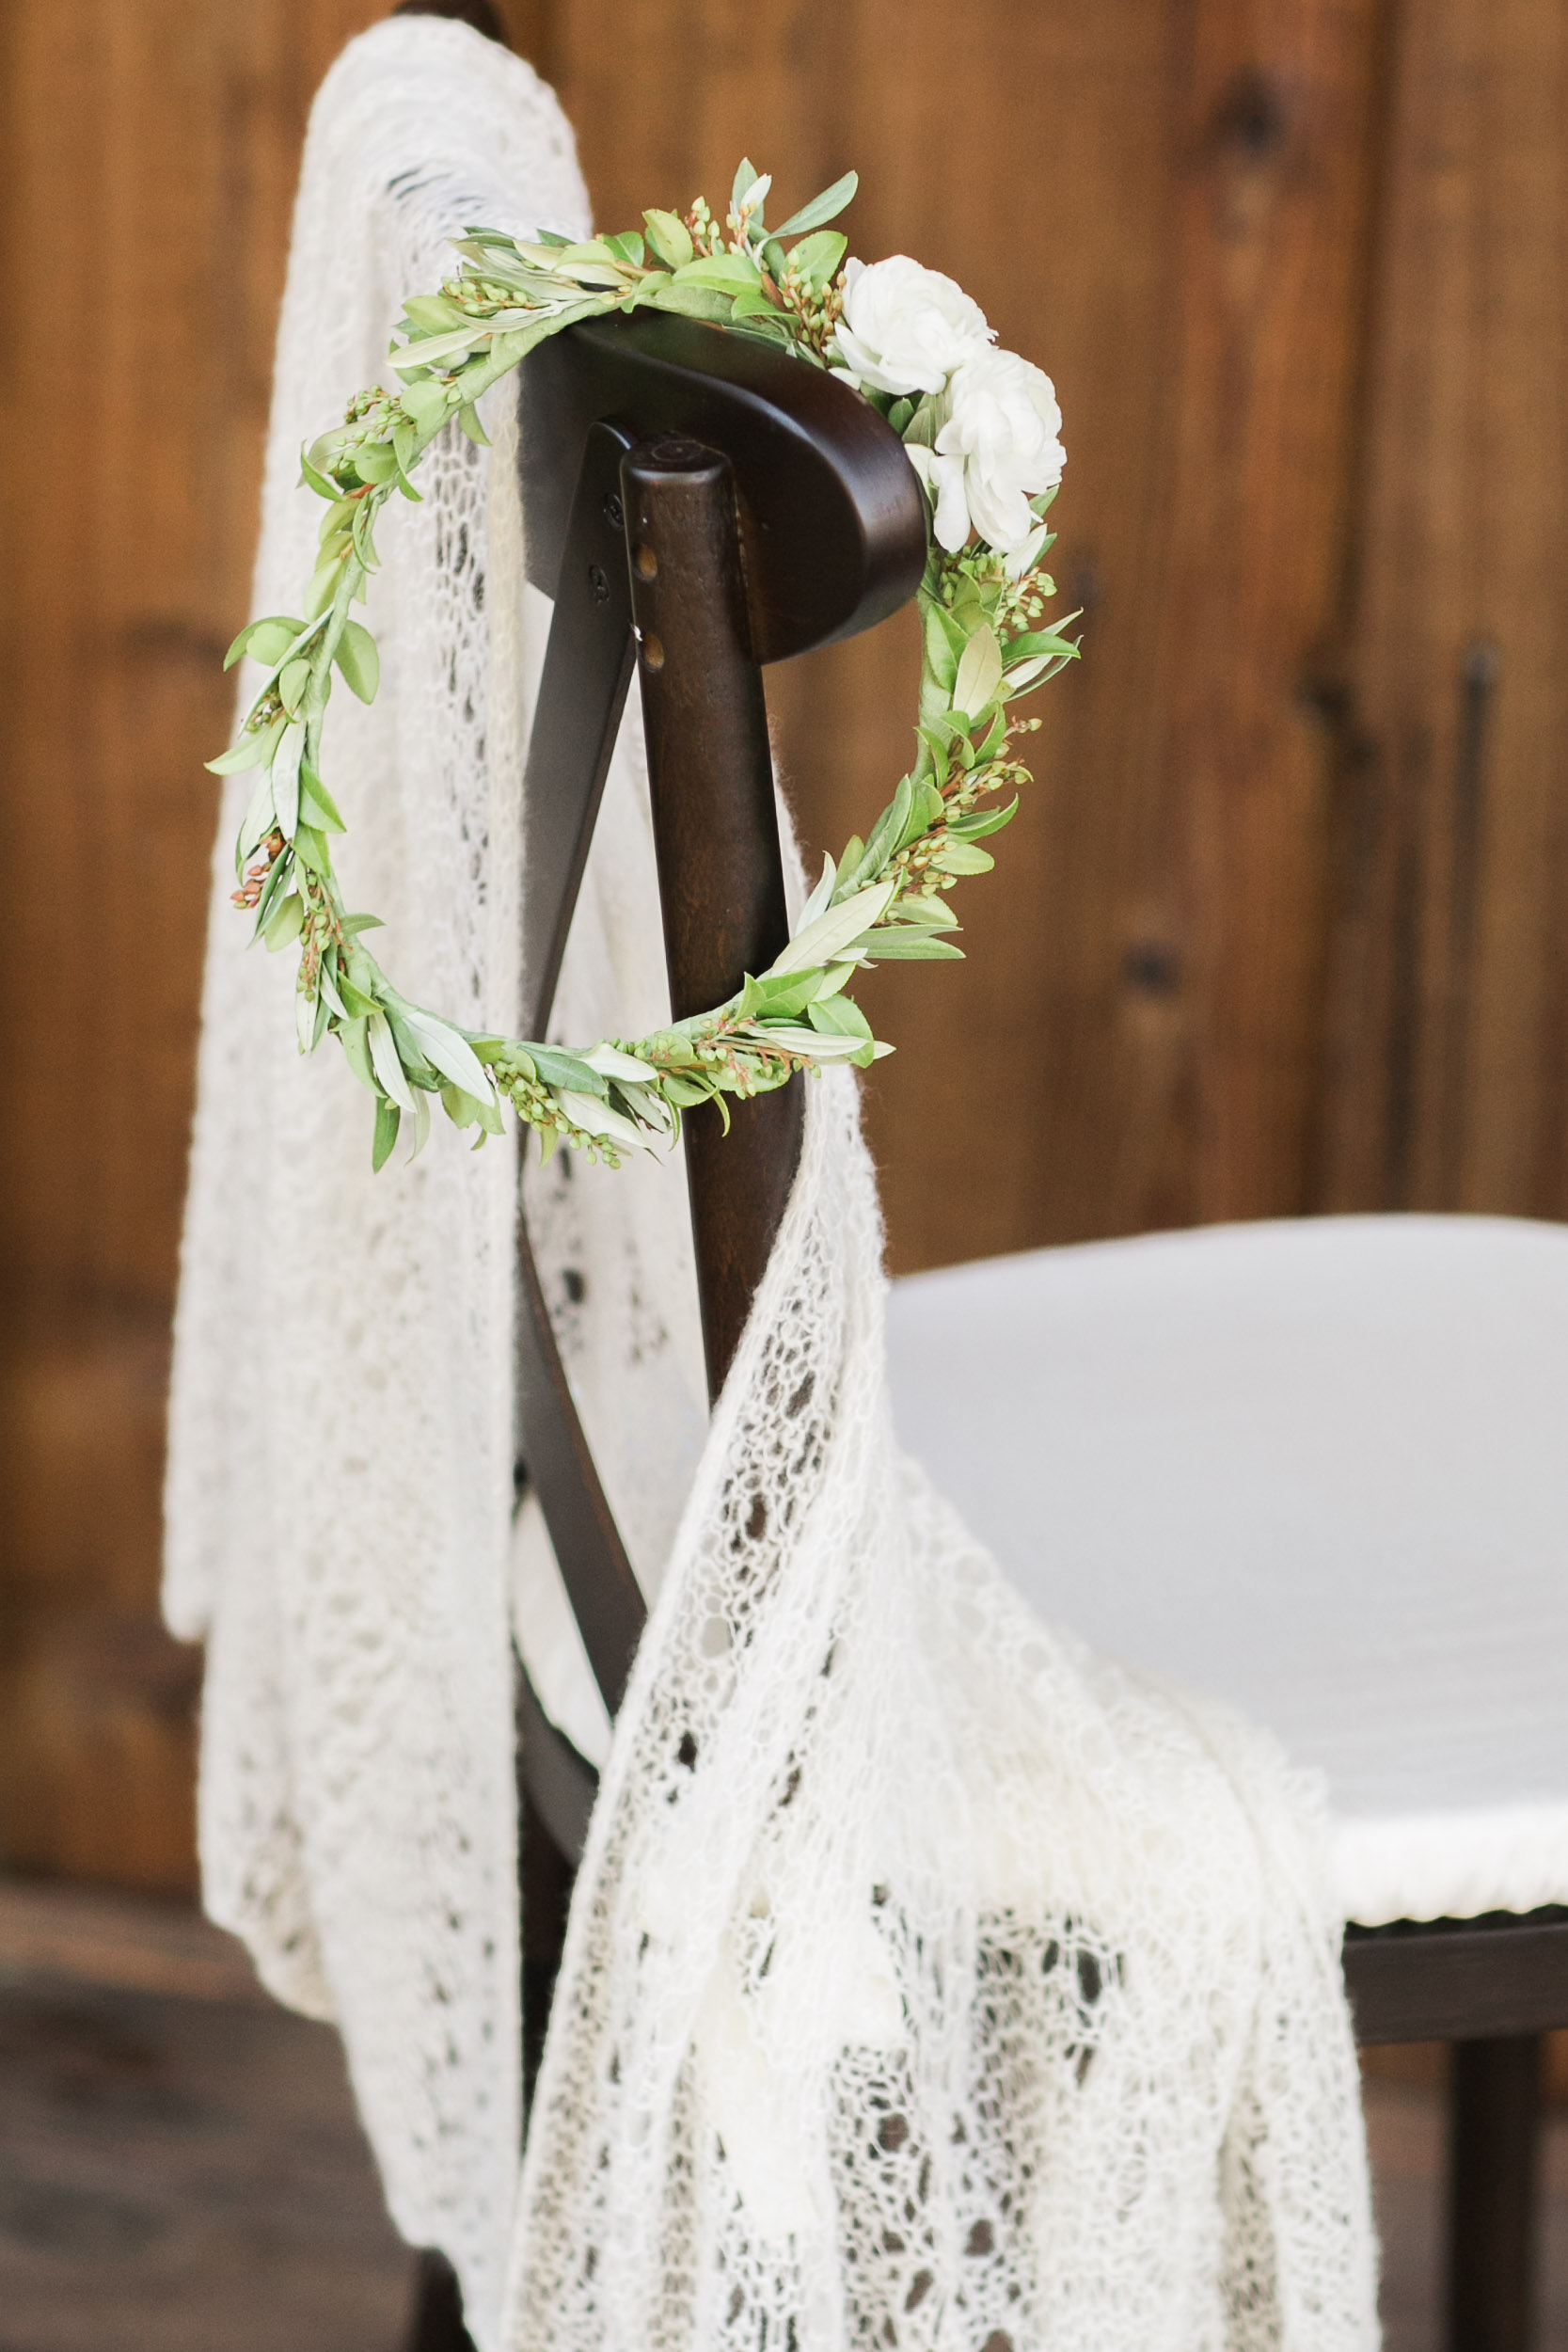 062116_C+T Carmel Wedding_Buena Lane Photography_4075.jpg